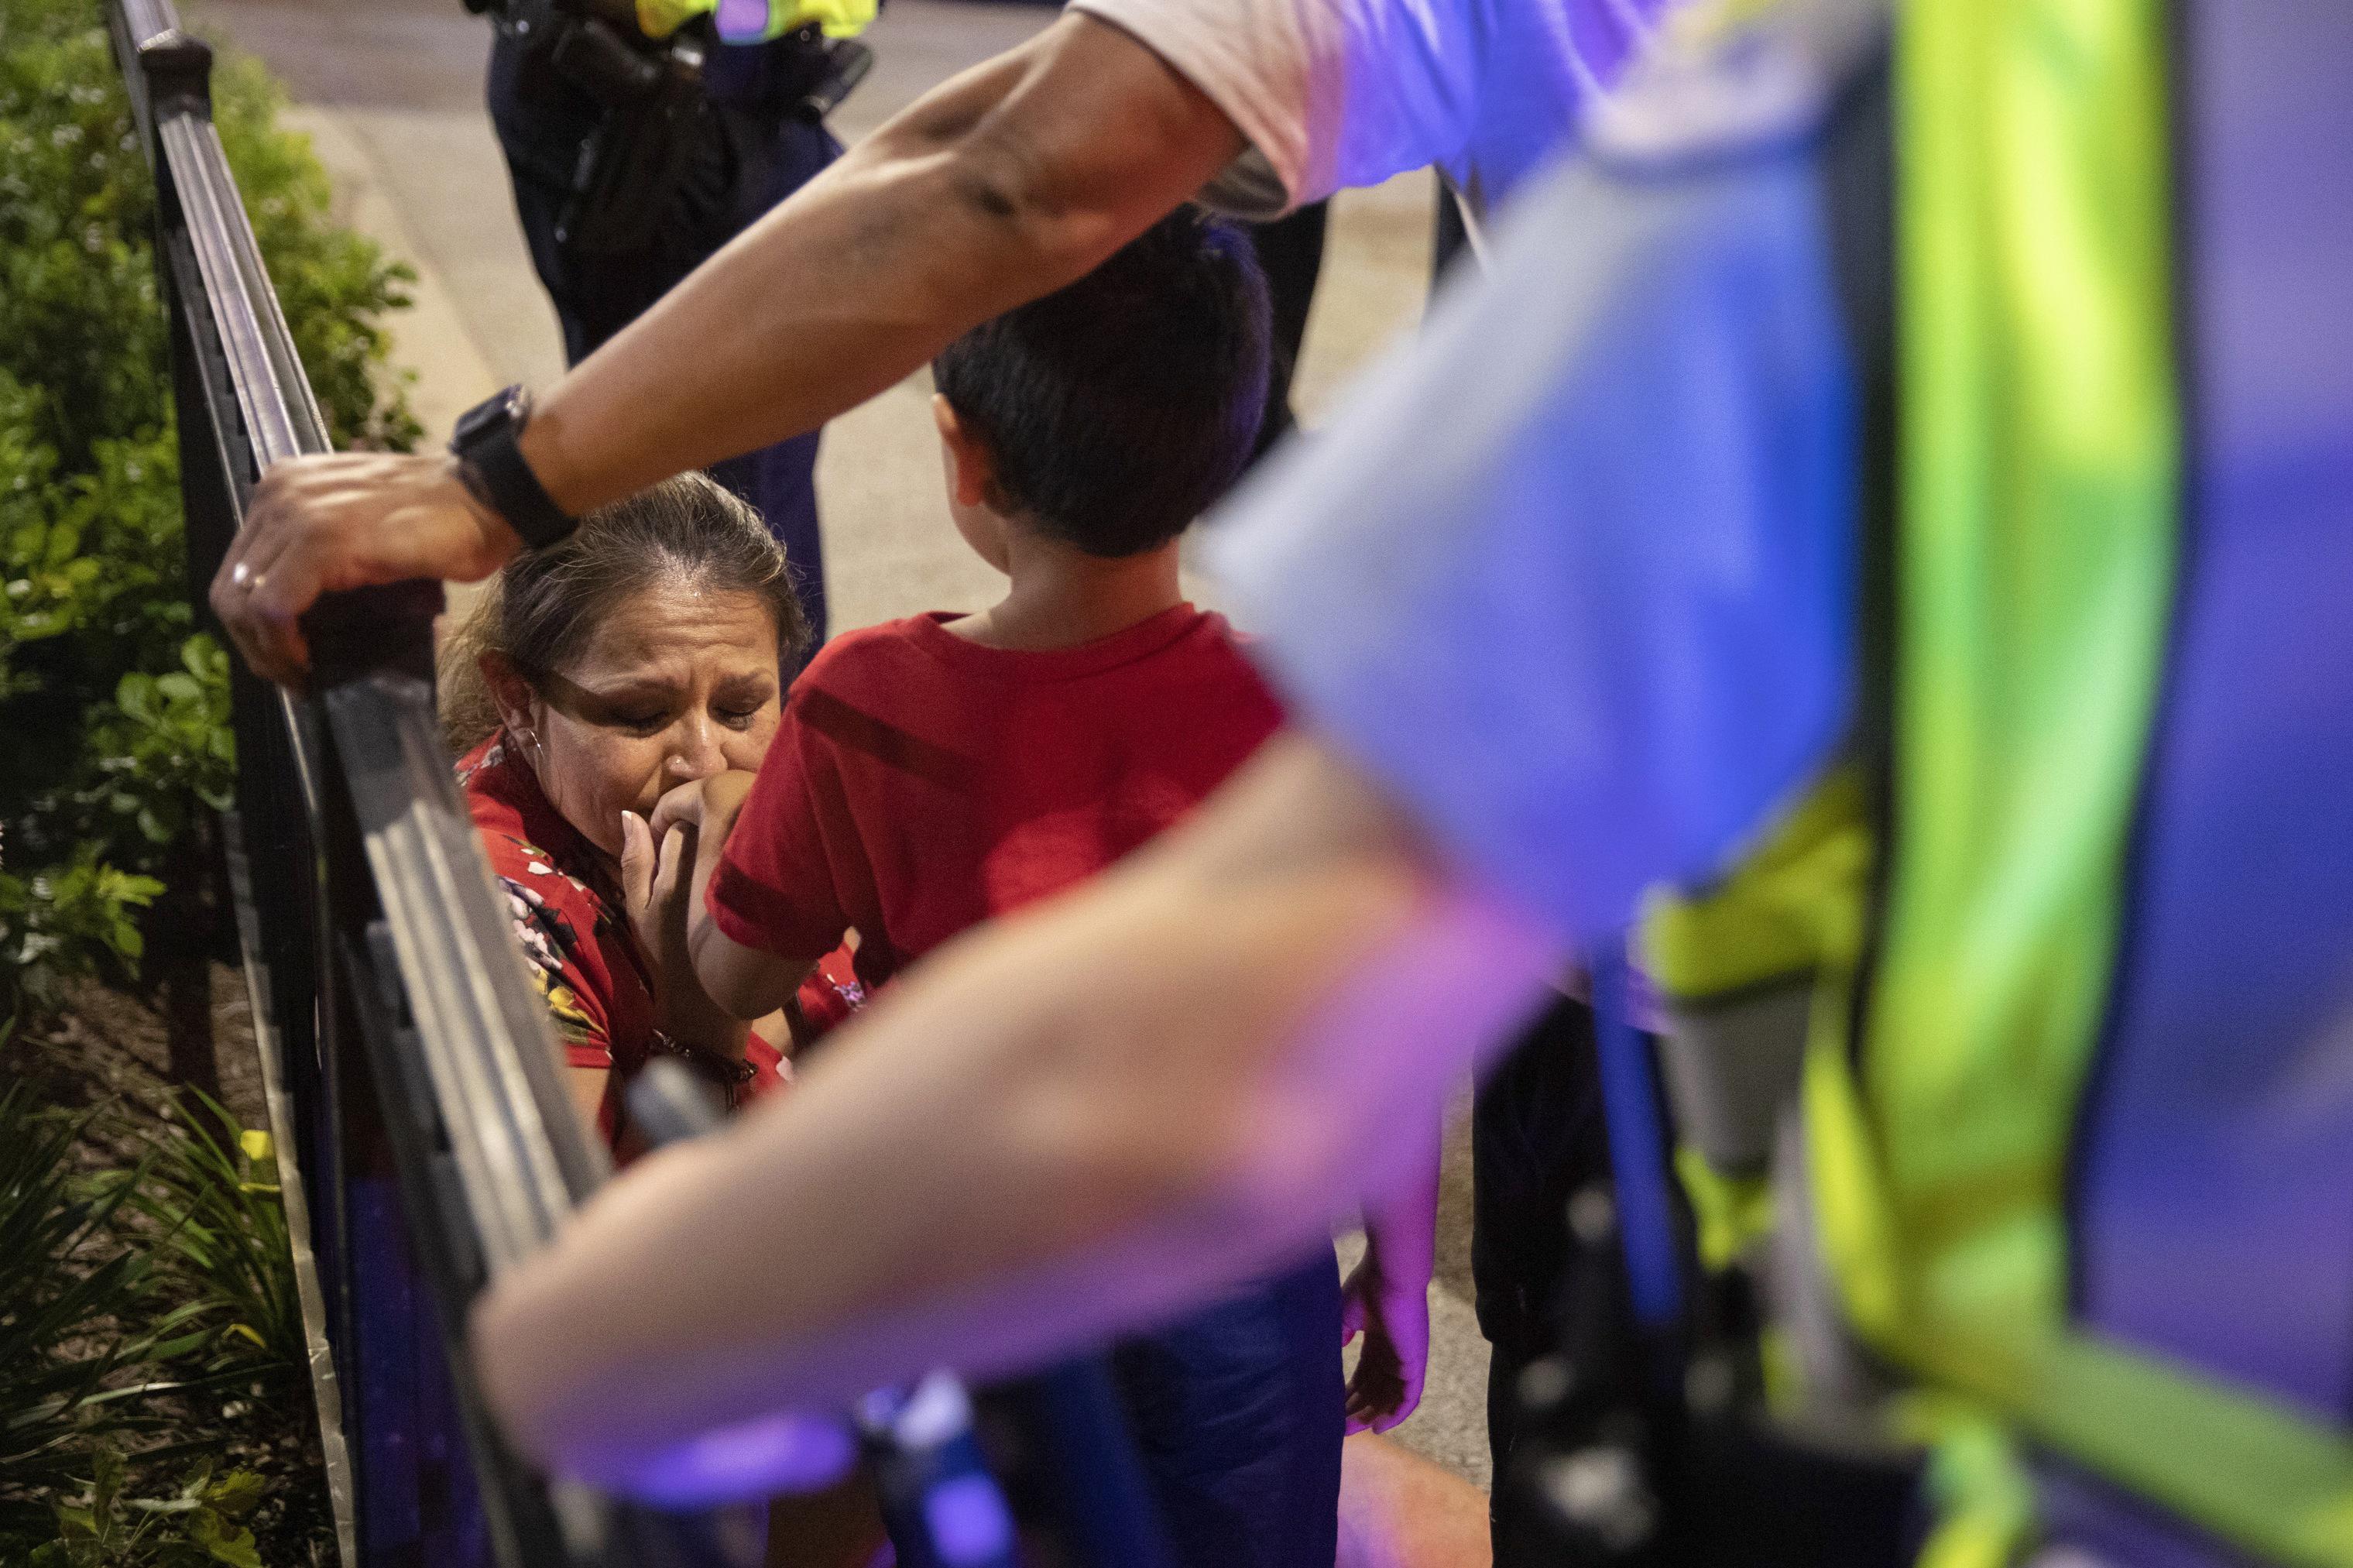 Police: Security officers gunshot warning caused stampede